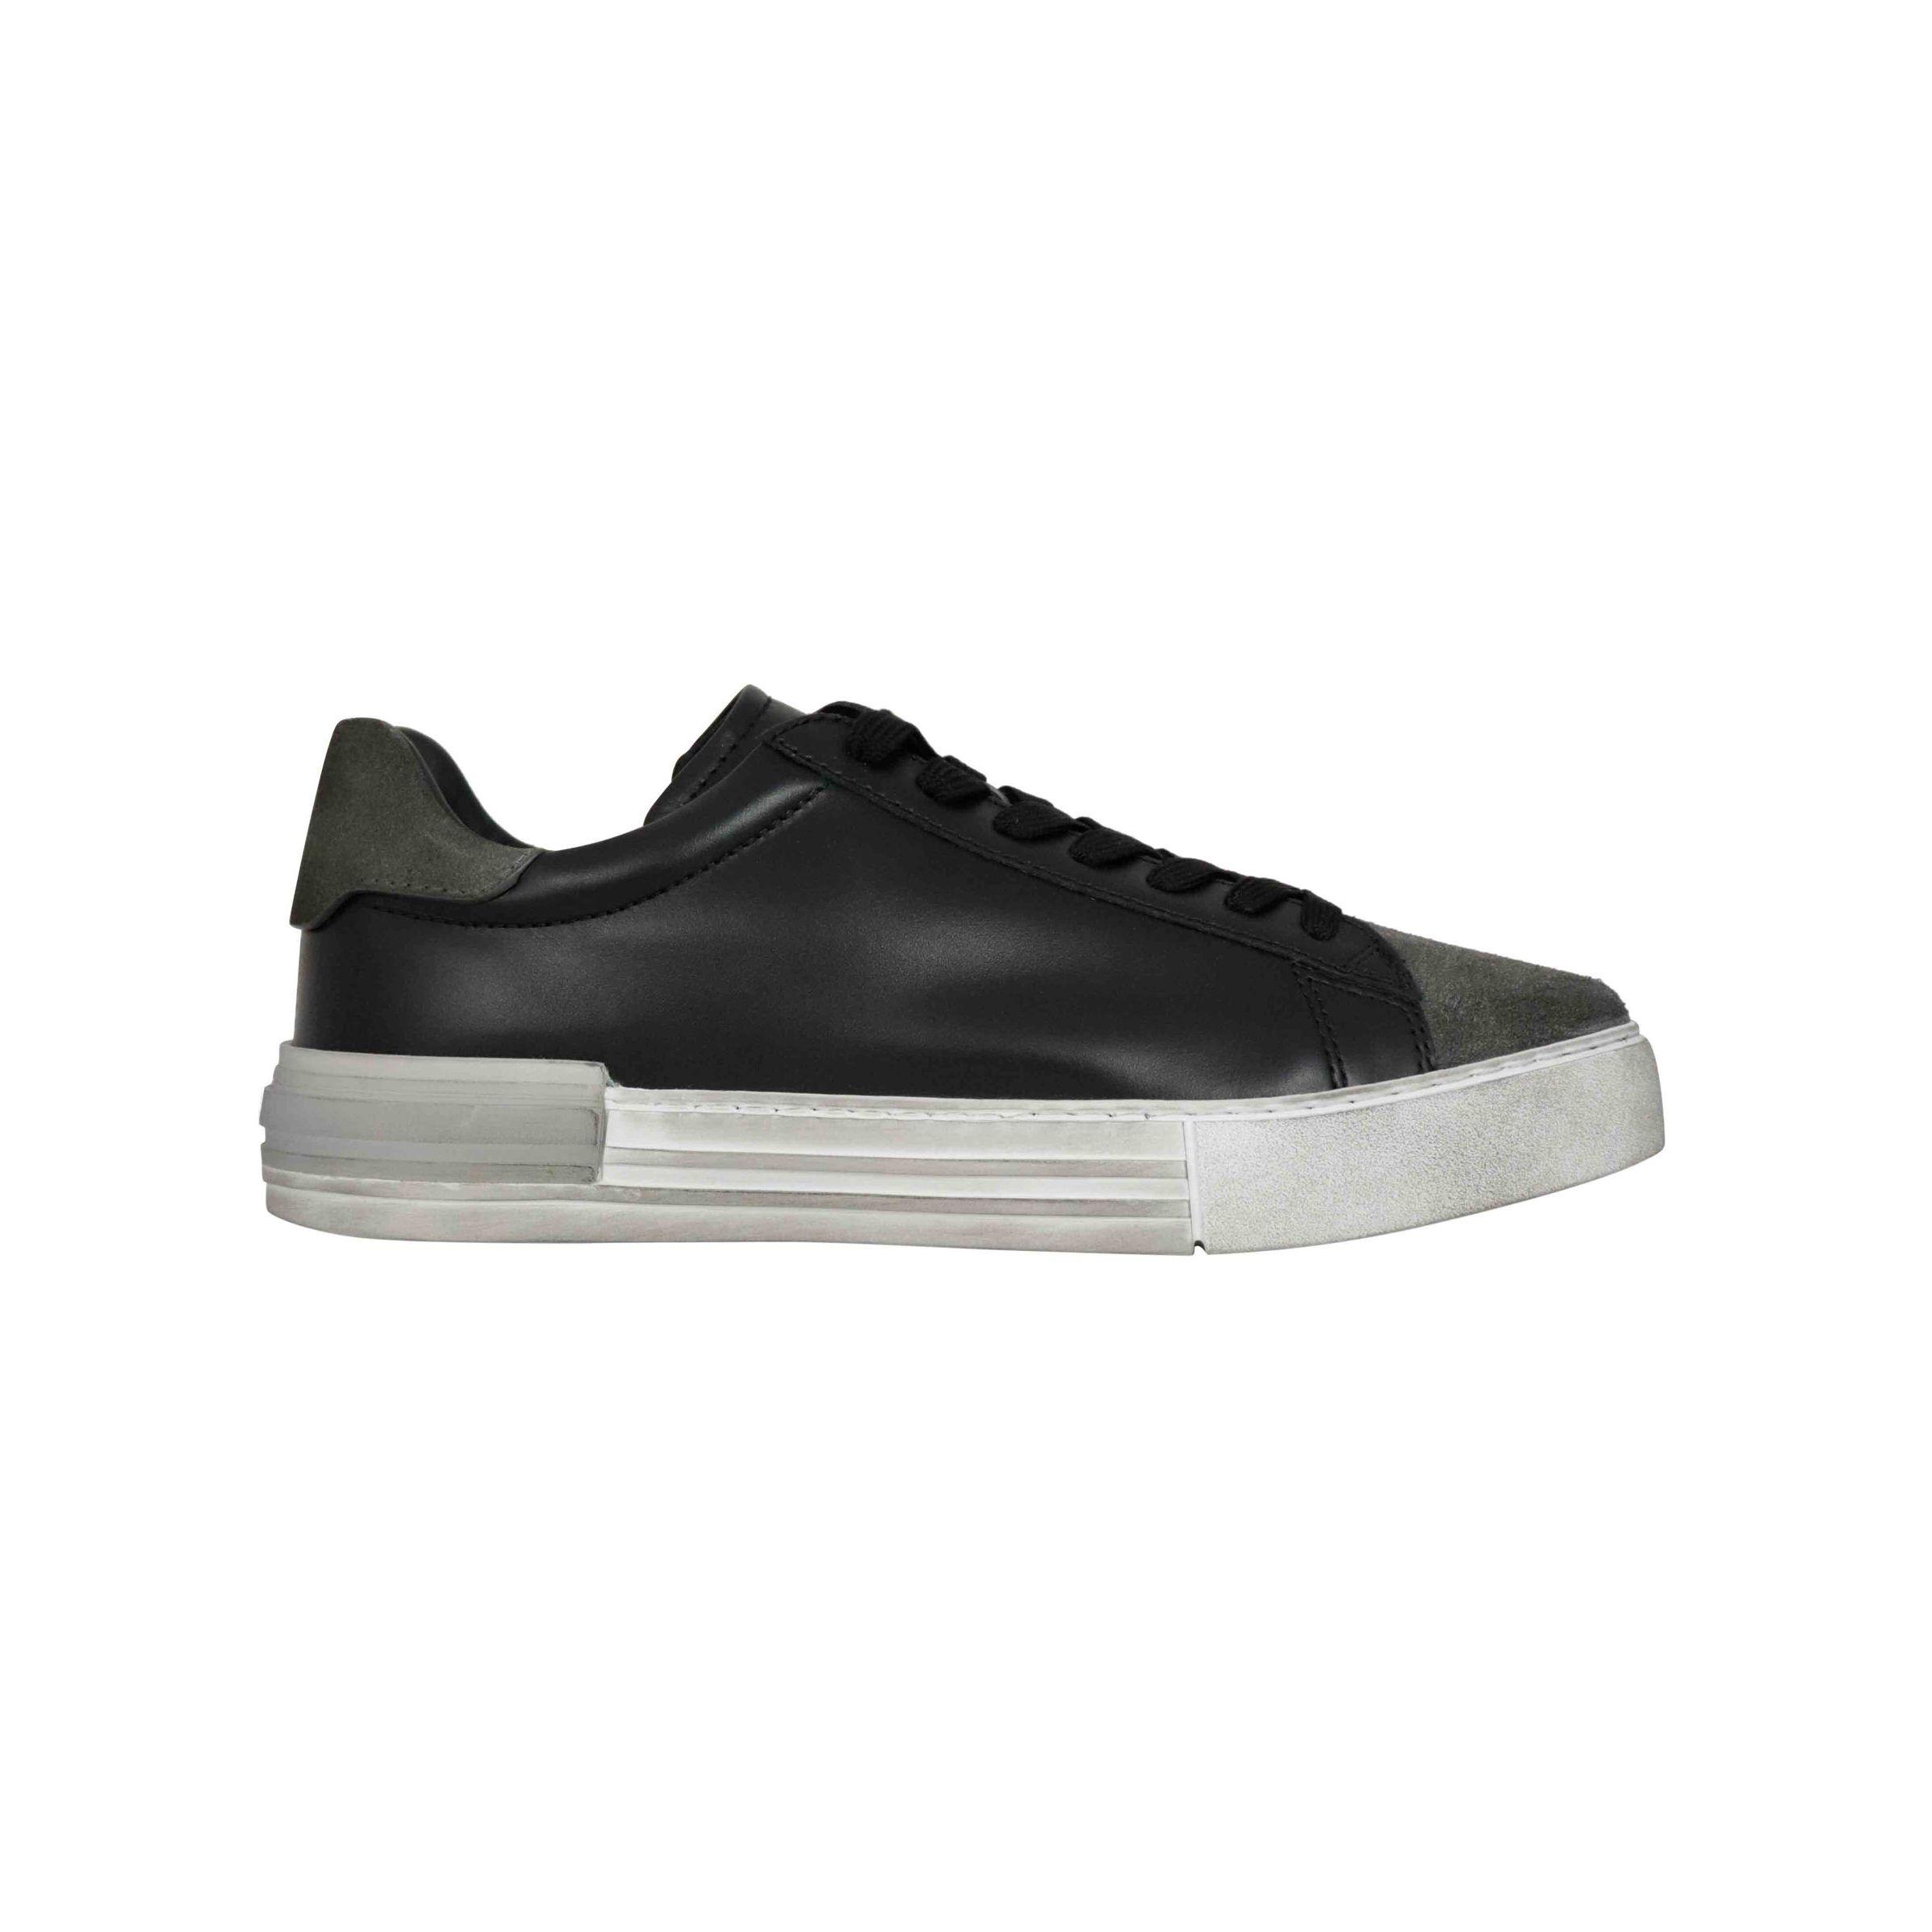 Sneakers Hogan Rebel in pelle effetto vintage Nero/grigio ...